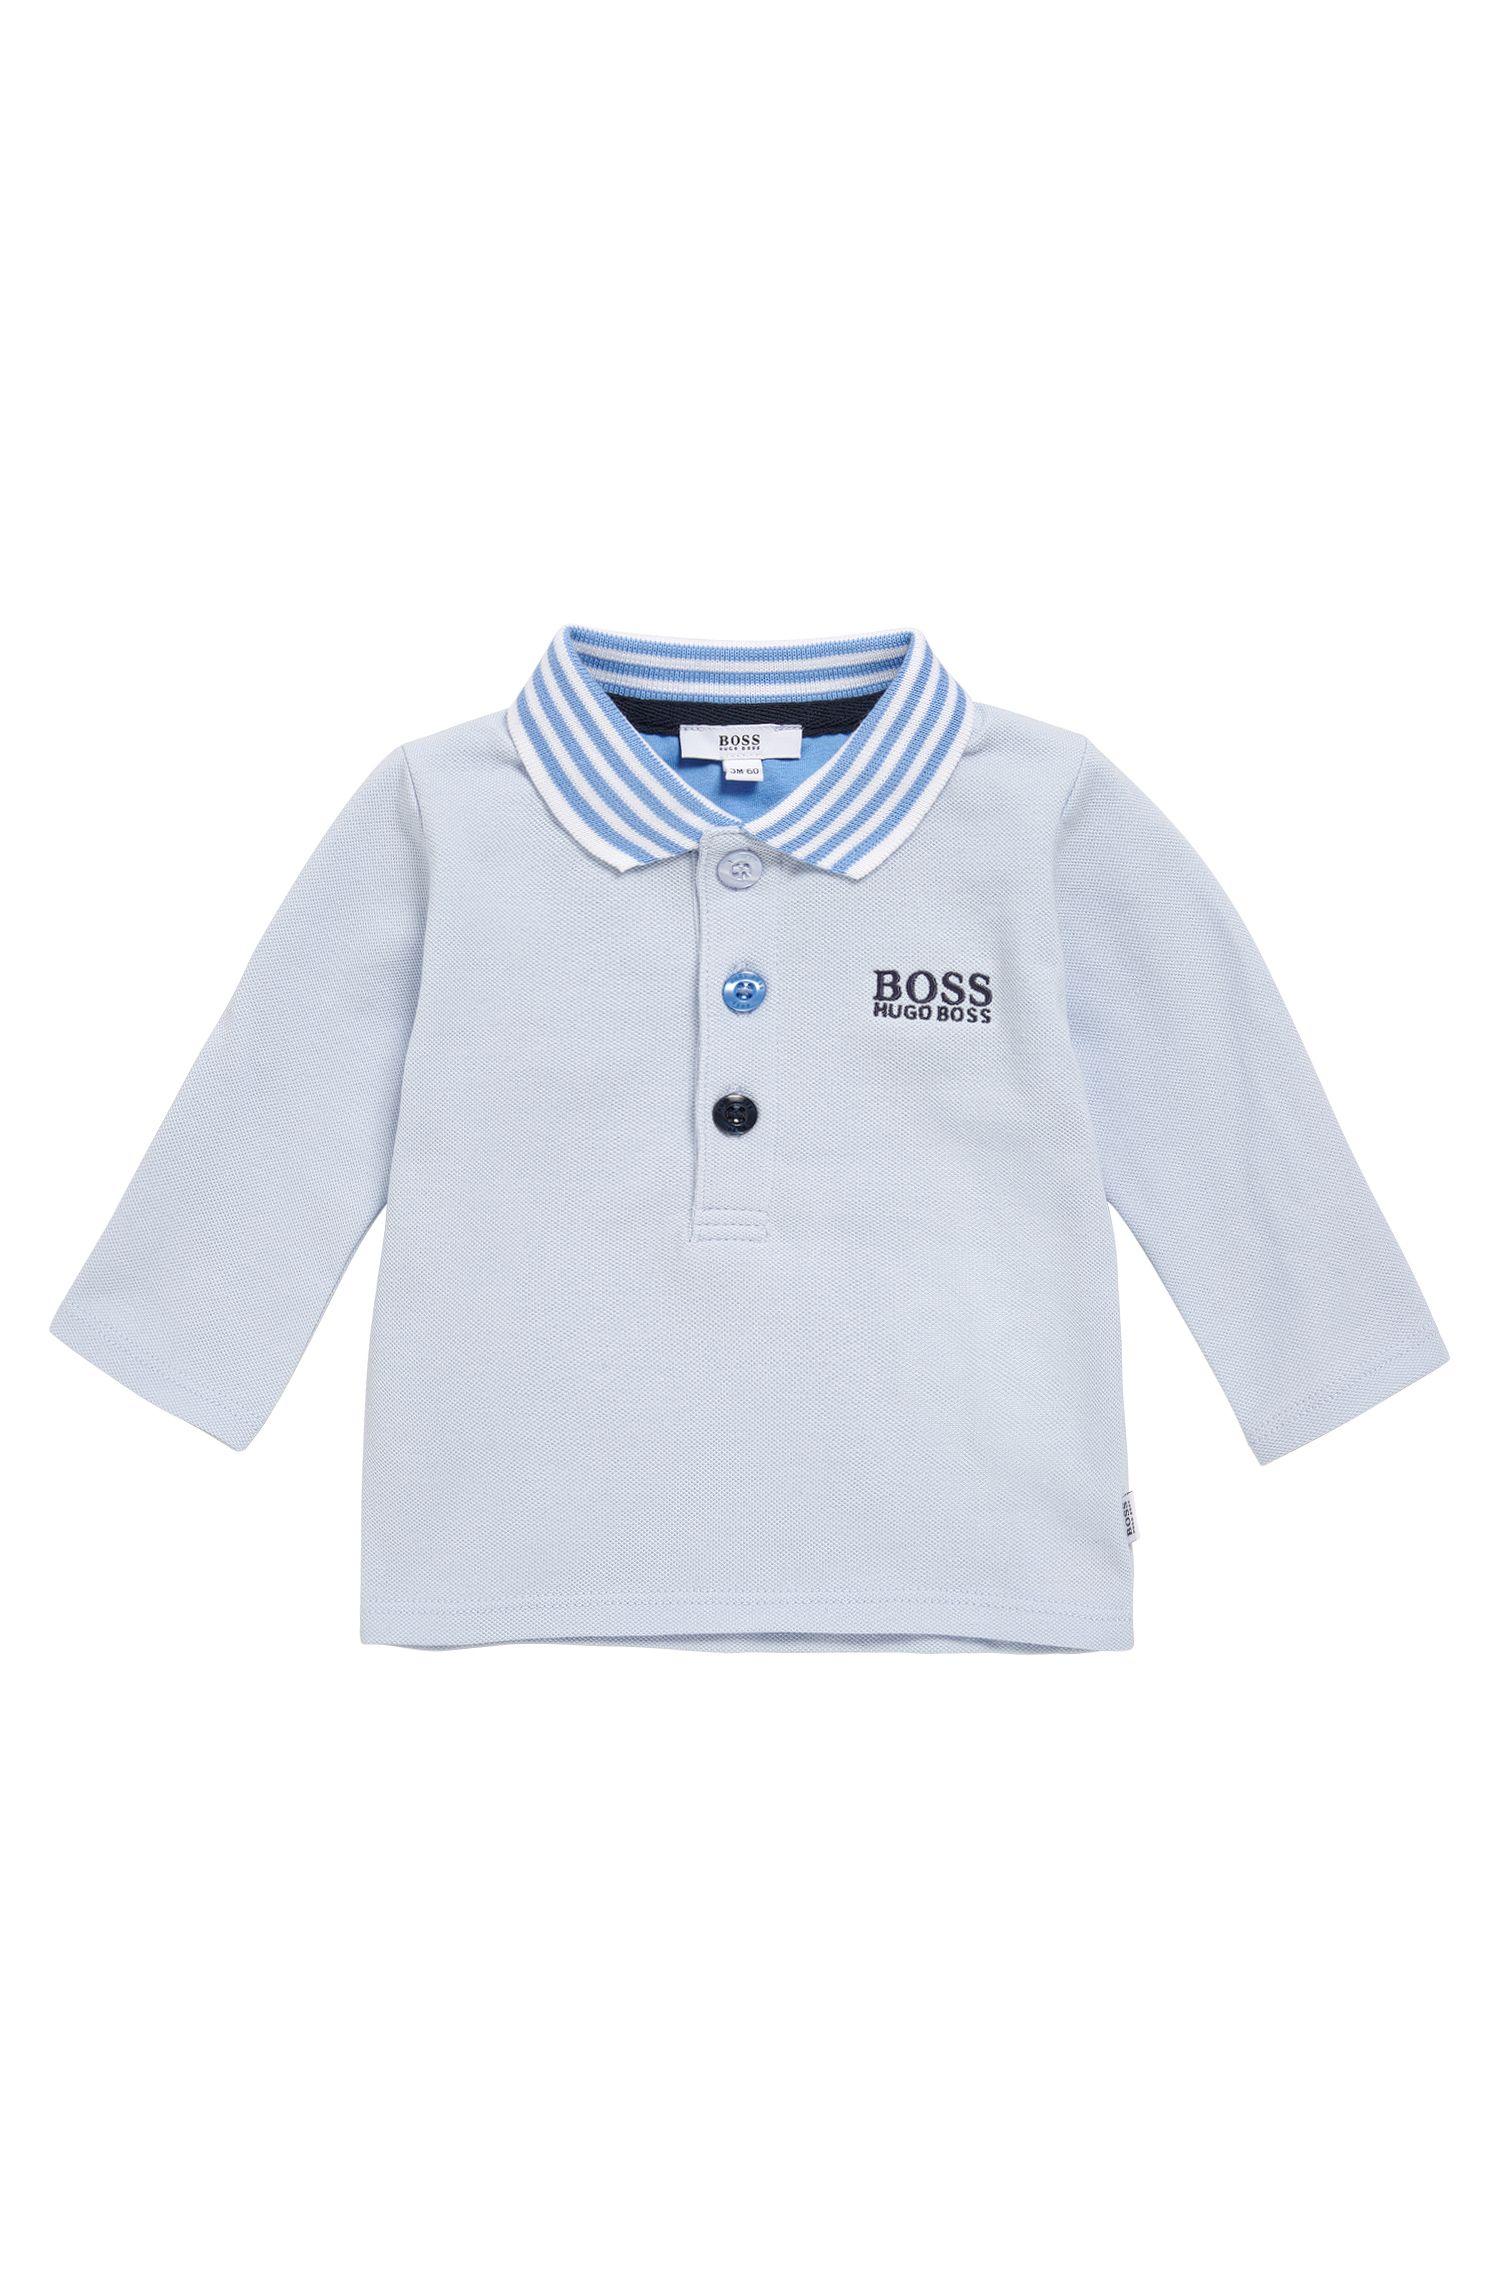 Polo para bebé en algodón elástico con rayas contrastadas: 'J95210'